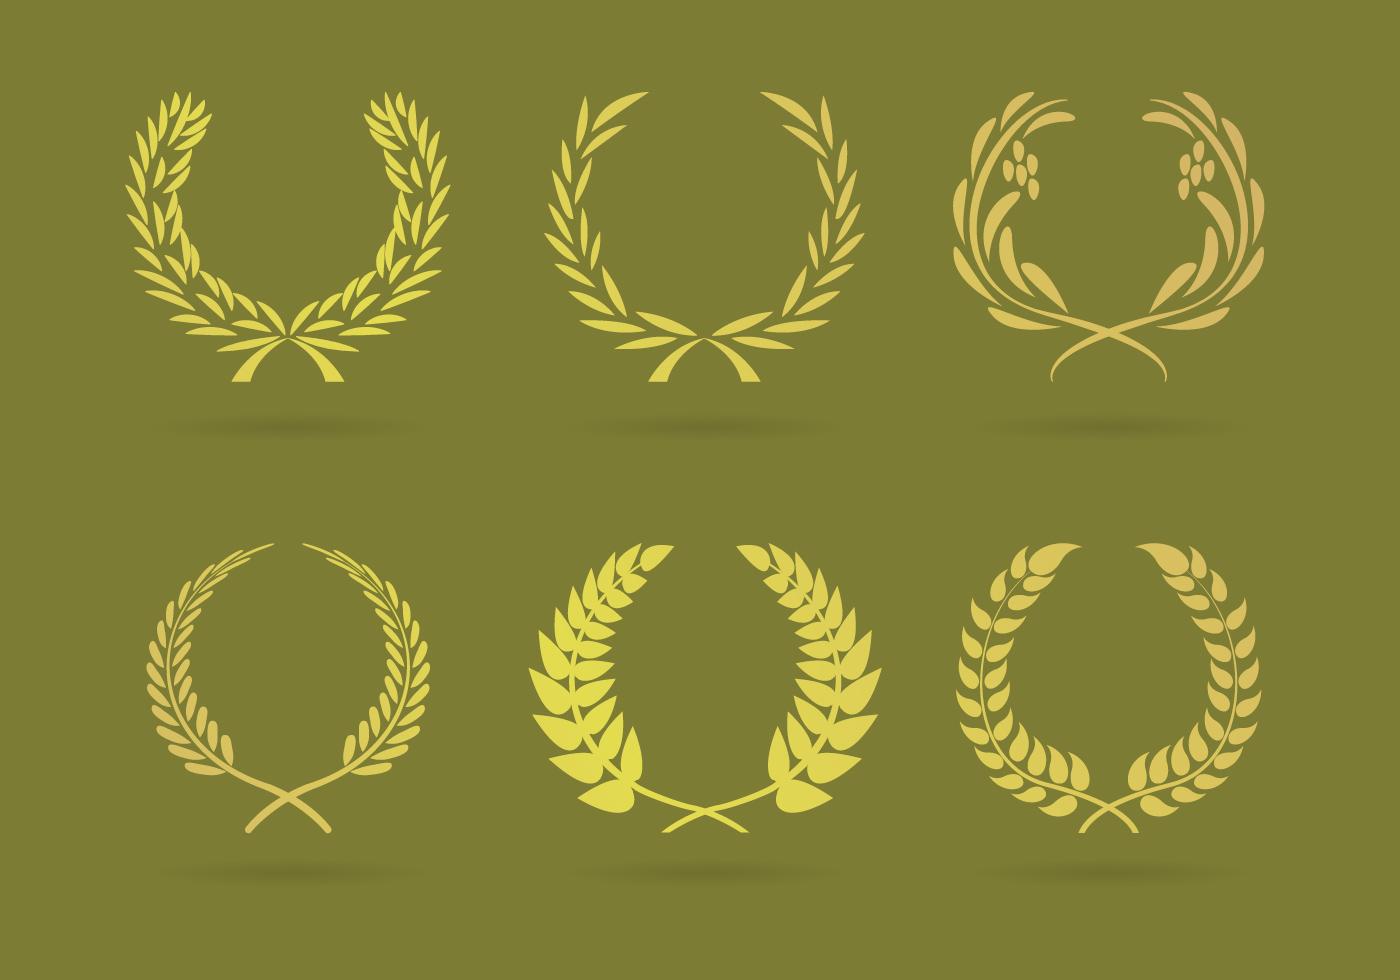 wreaths illustrations vector download free vector art